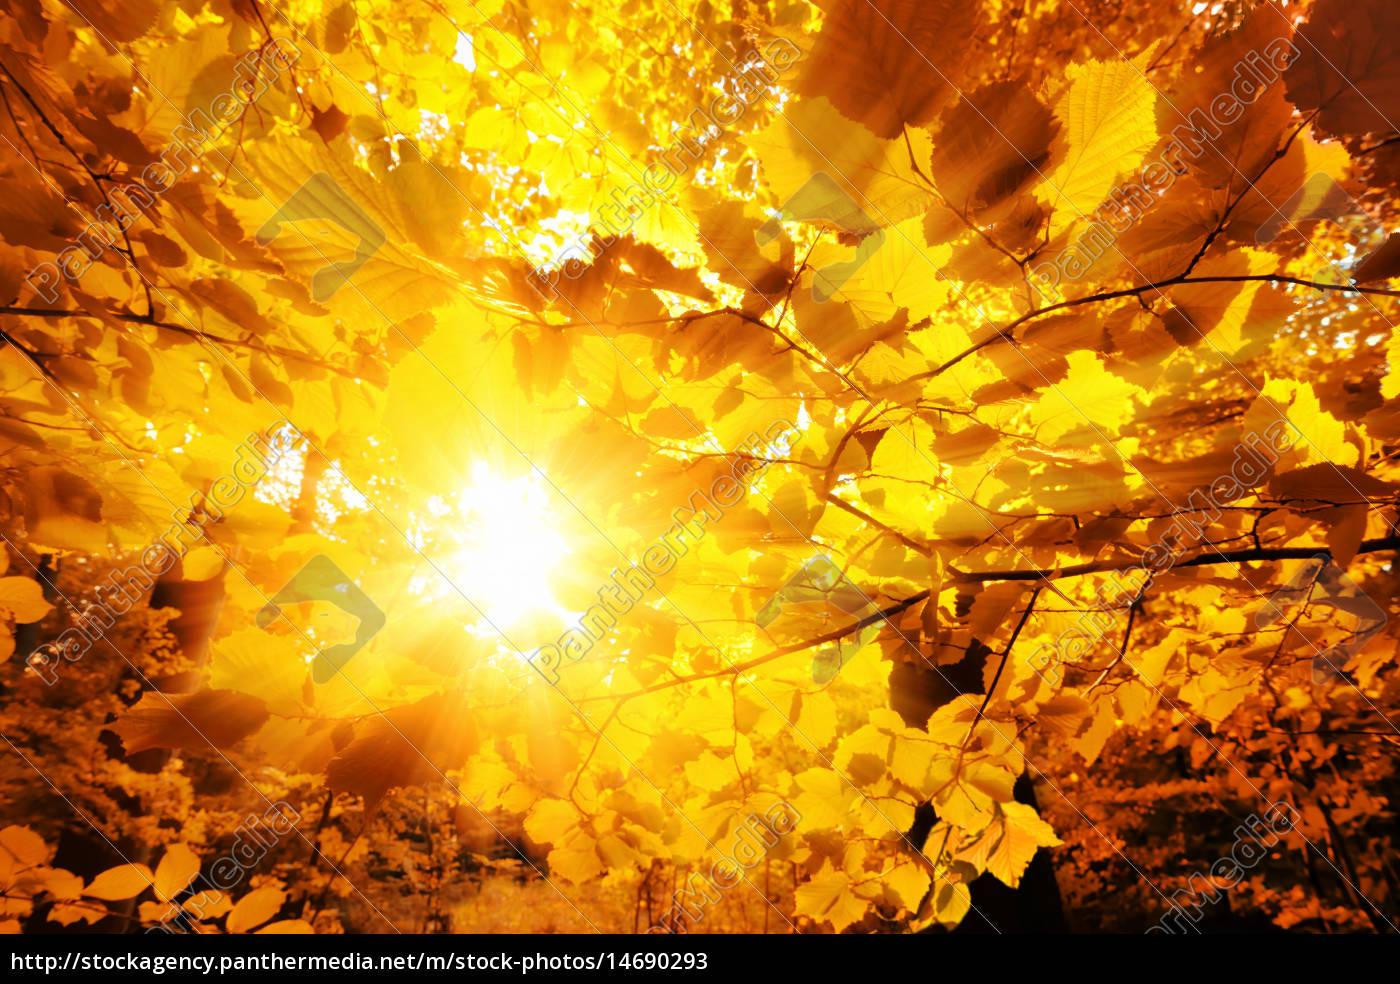 the, sun, shining, through, autumn, leaves - 14690293